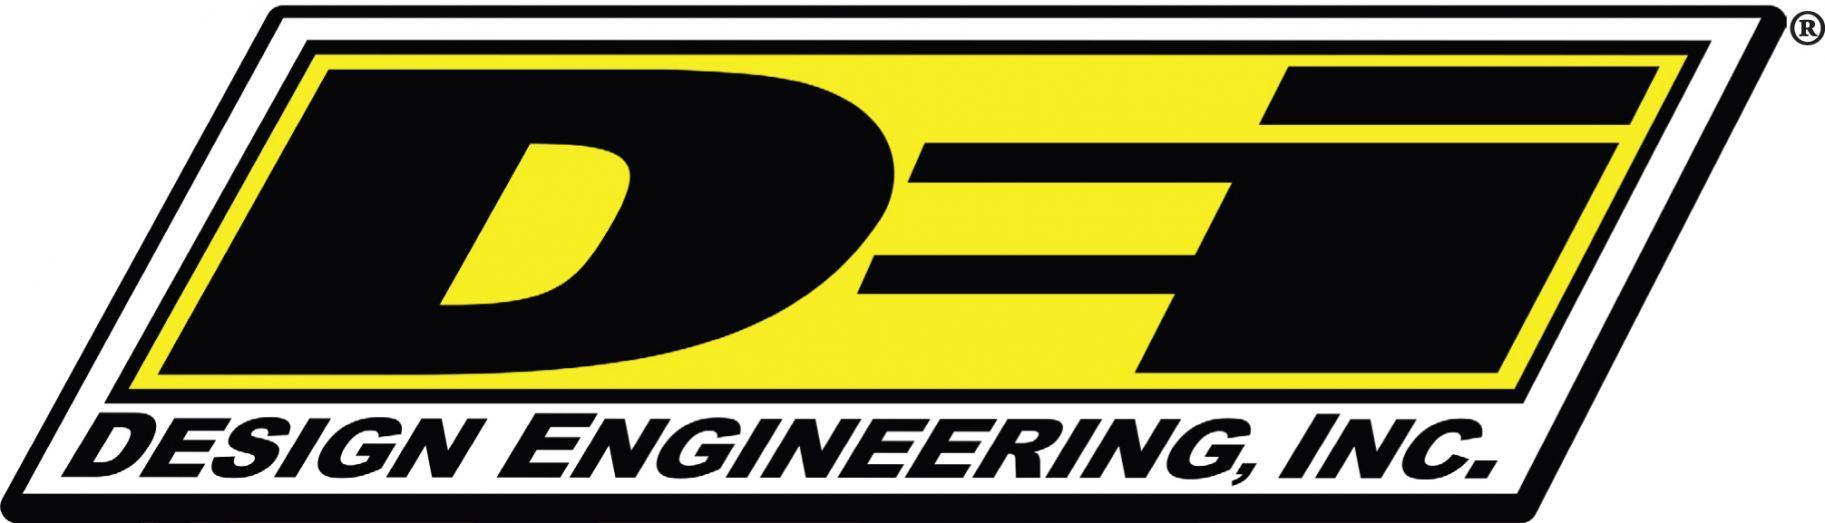 Design Engineering Inc.